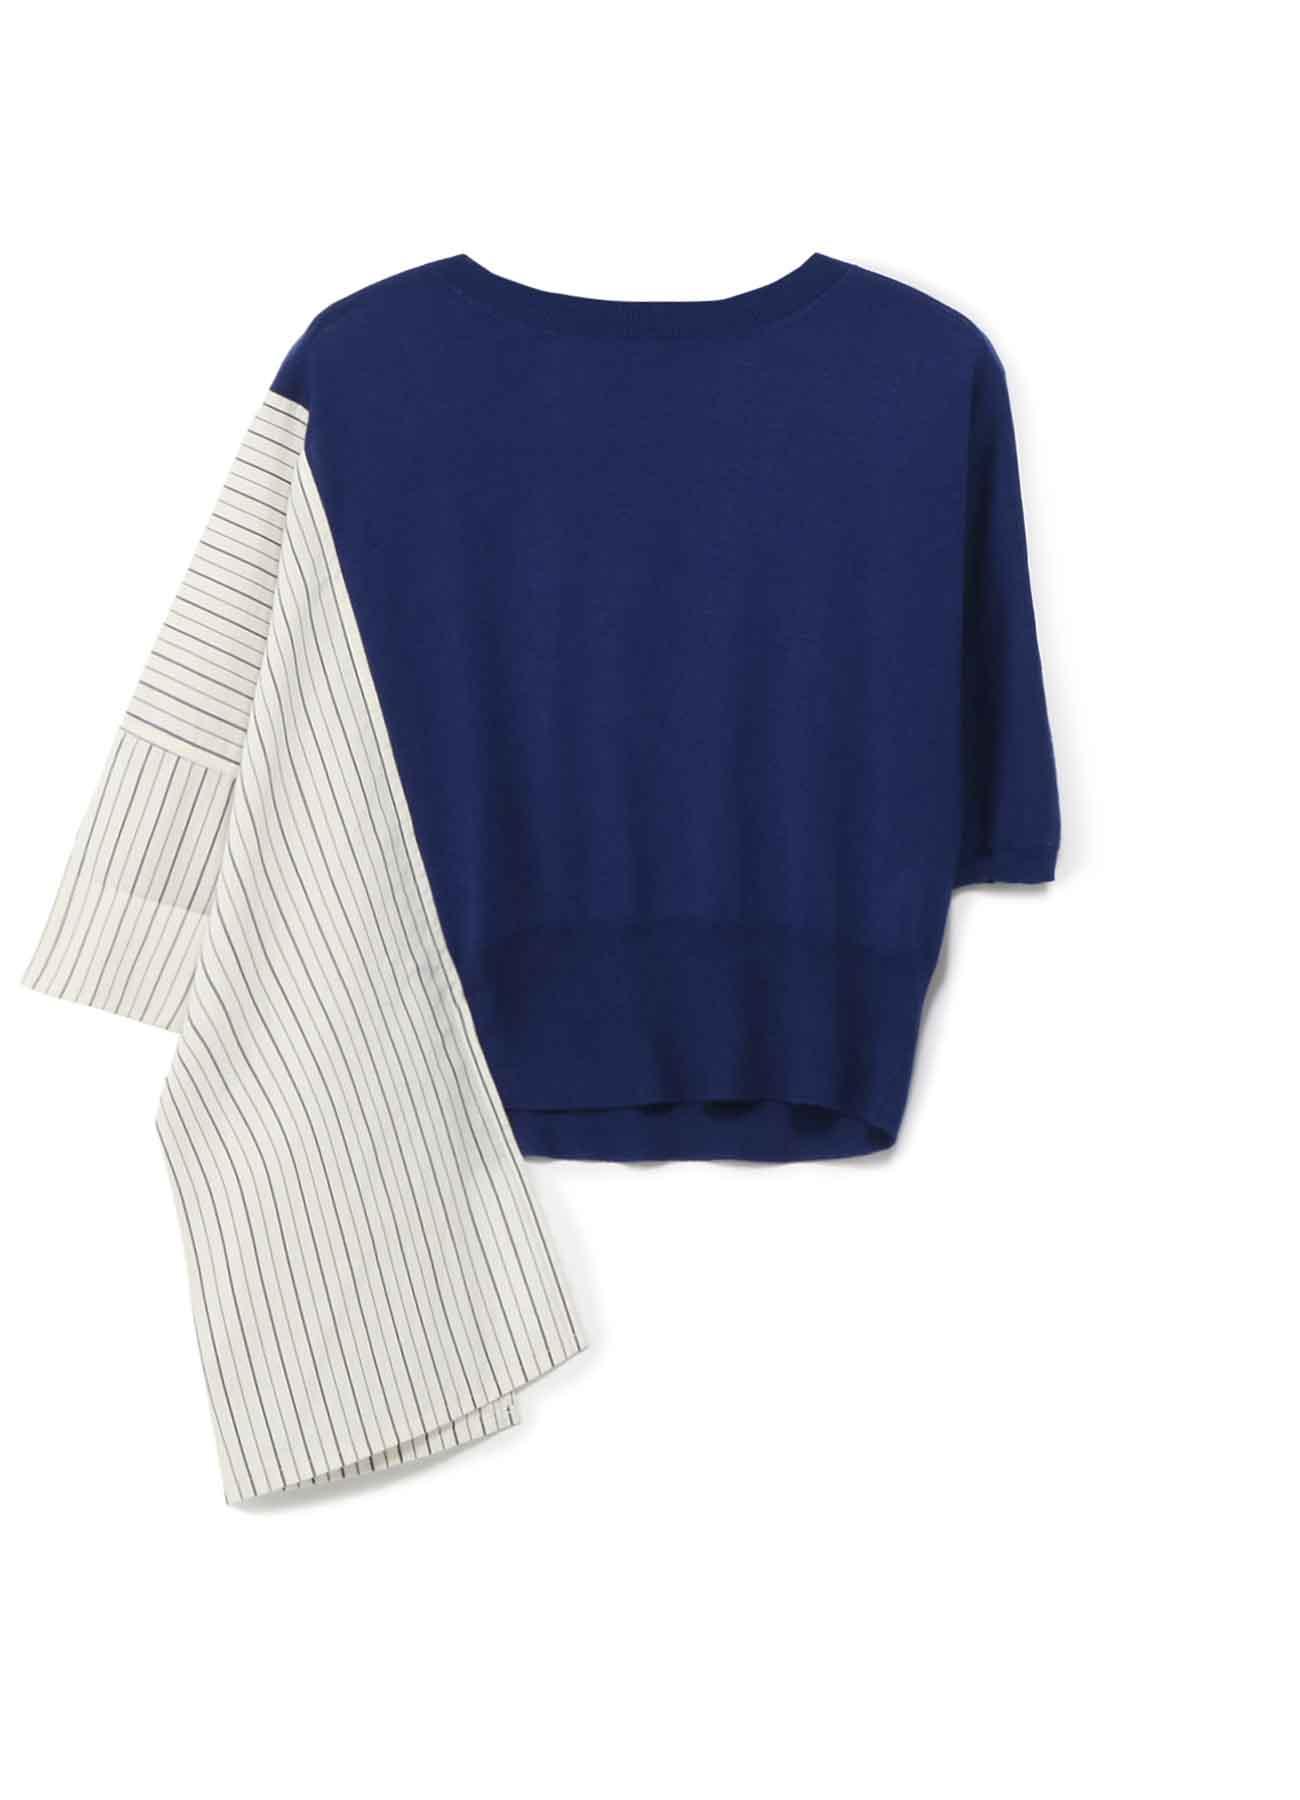 RISMATby Y's棉质人造丝真丝衬衫切换不对称套头衫